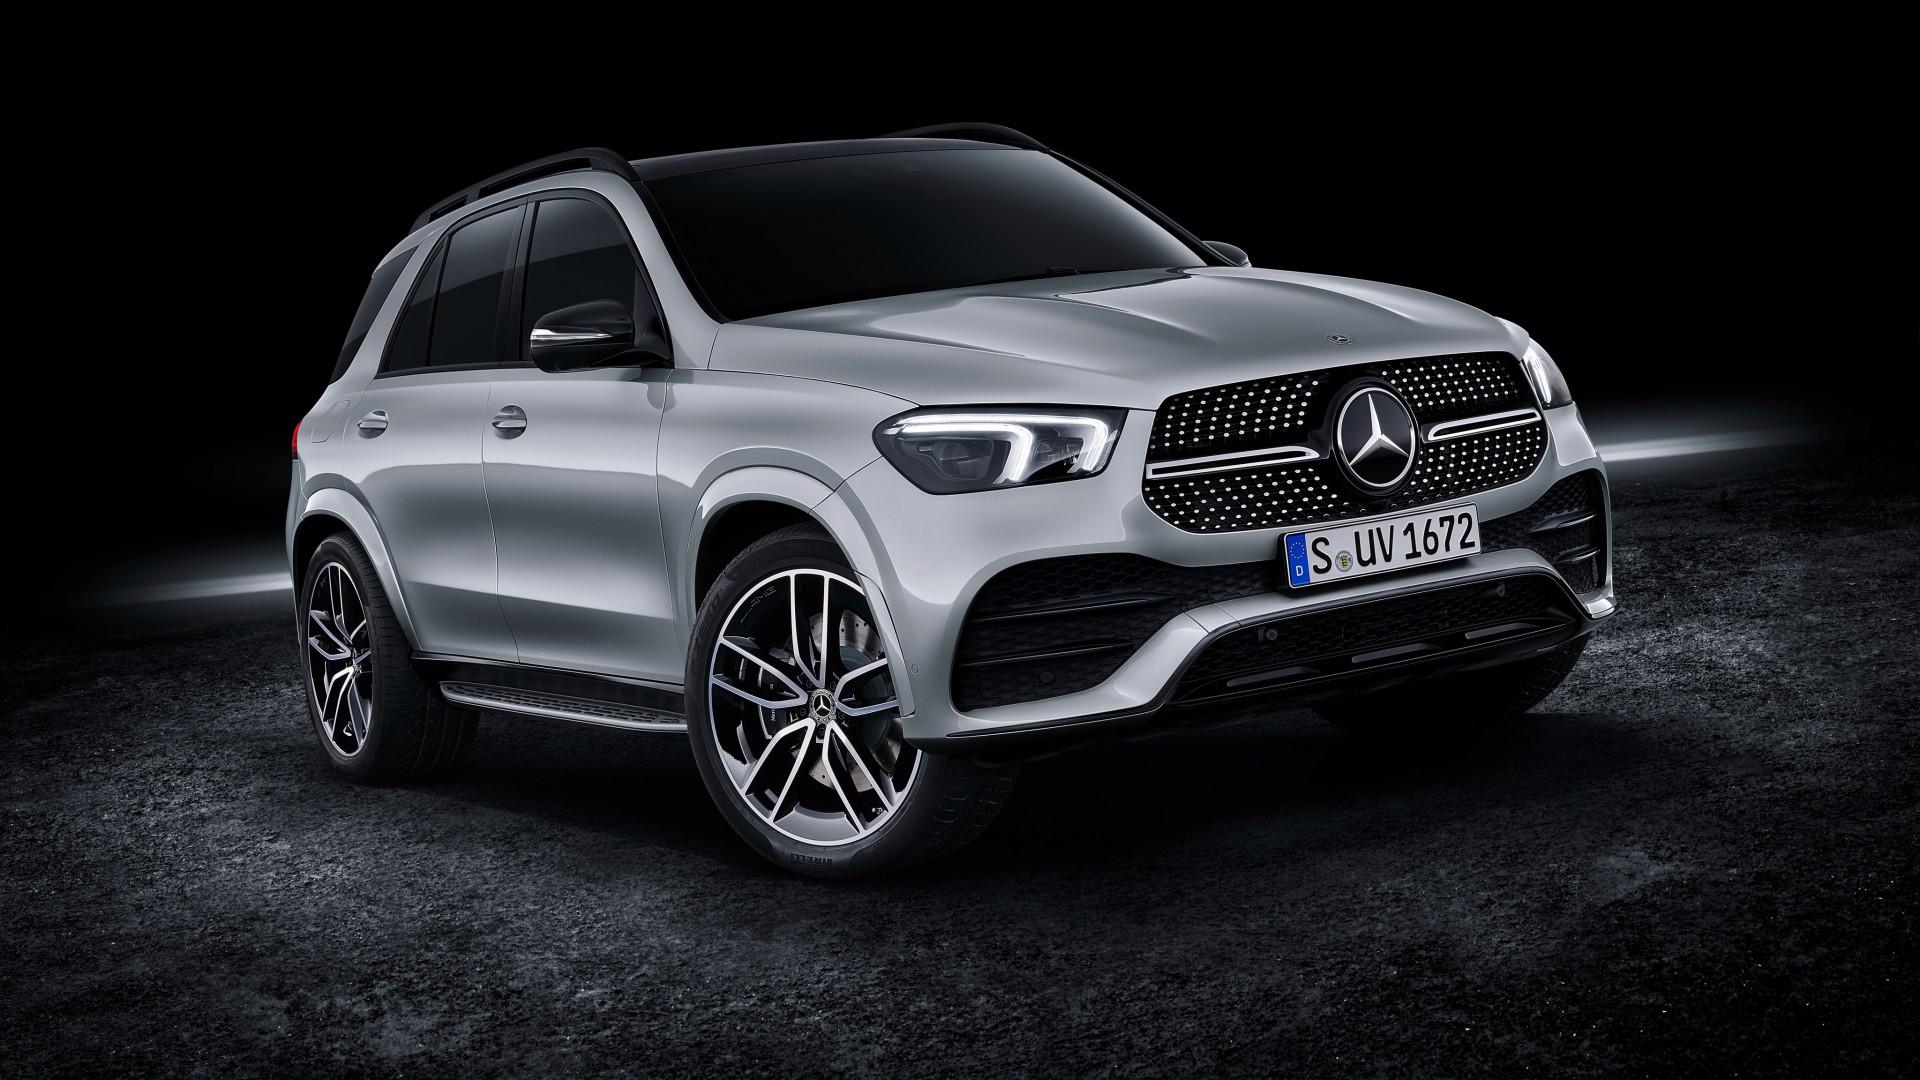 Car Wallpapers 4k Bentely Mercedes Benz Gle 450 4matic Amg Line 2019 4k Wallpaper